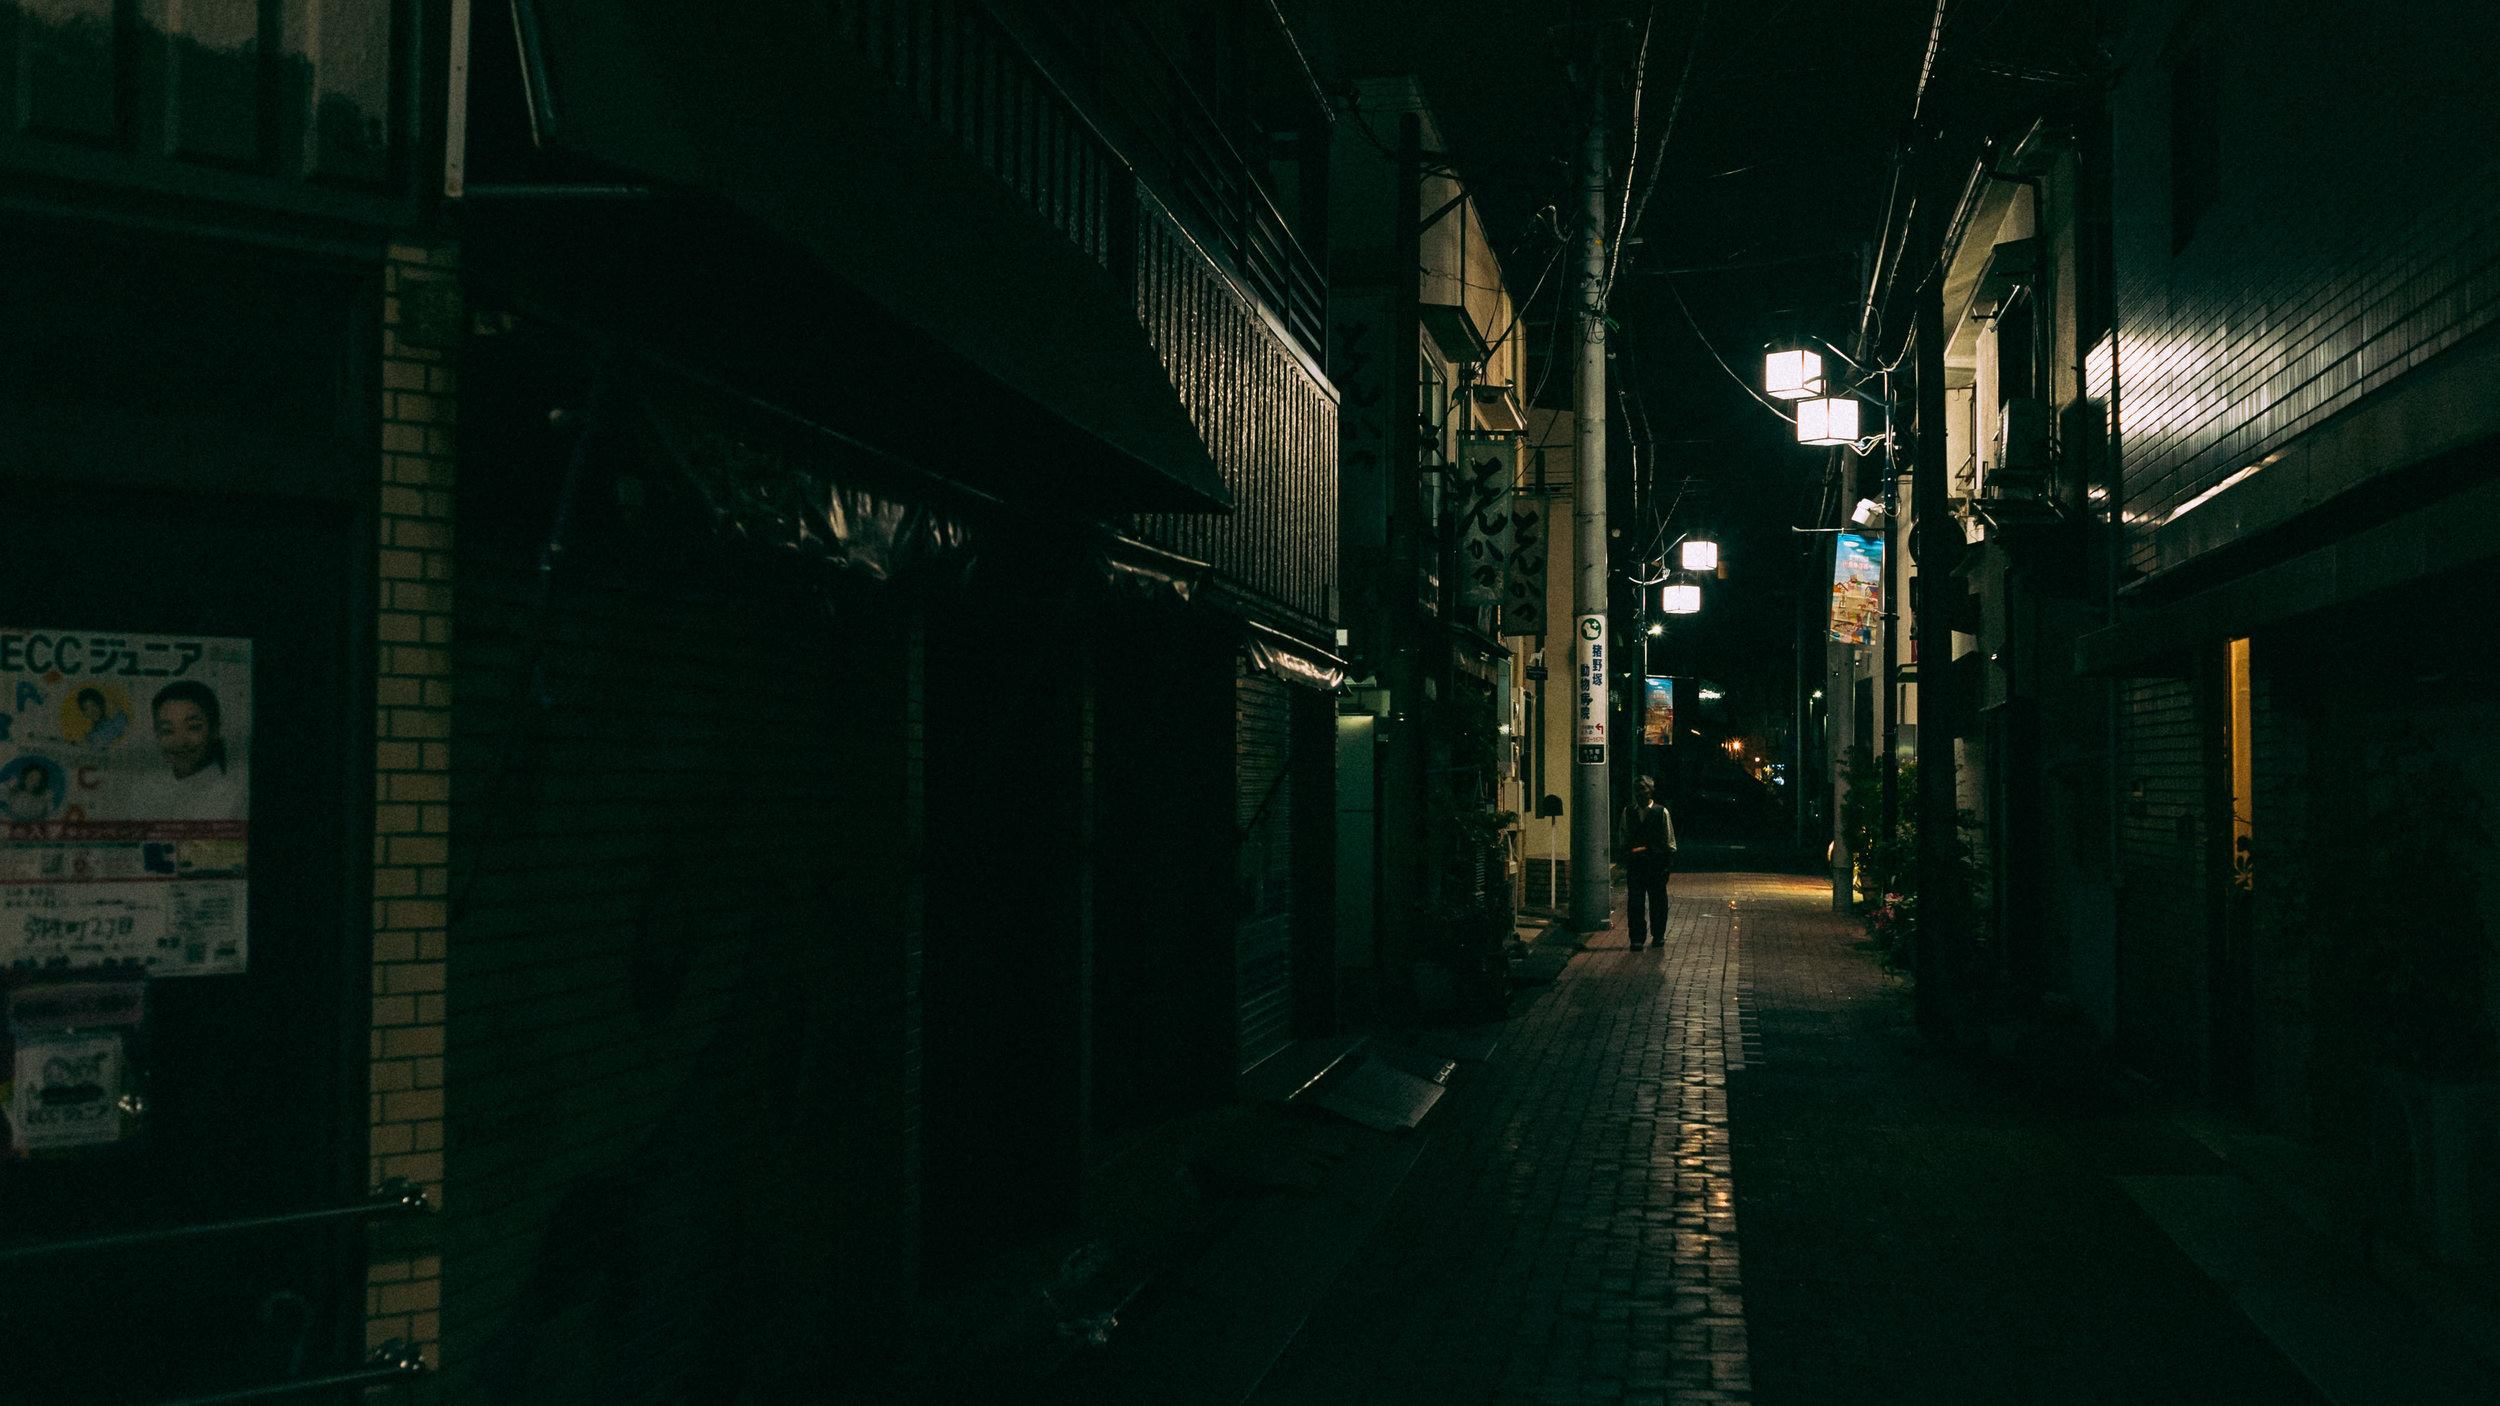 back-streets-night-tokyo-japan.jpg